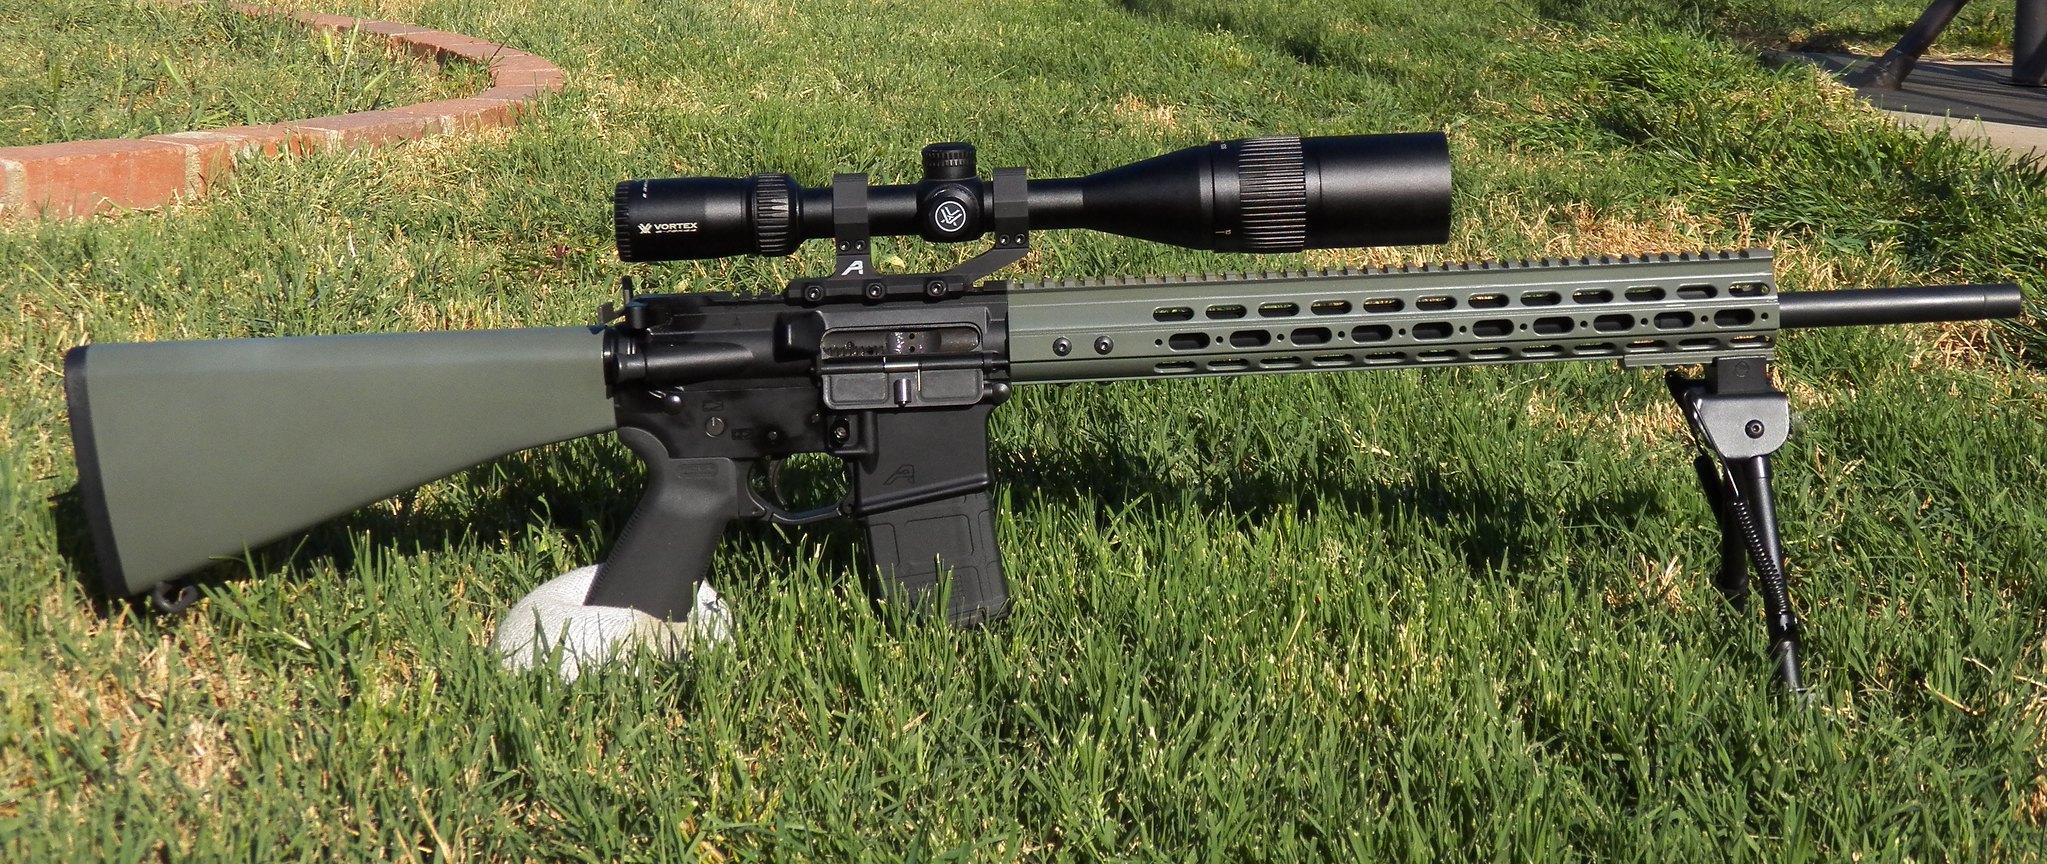 Rifle Scope Advice Needed